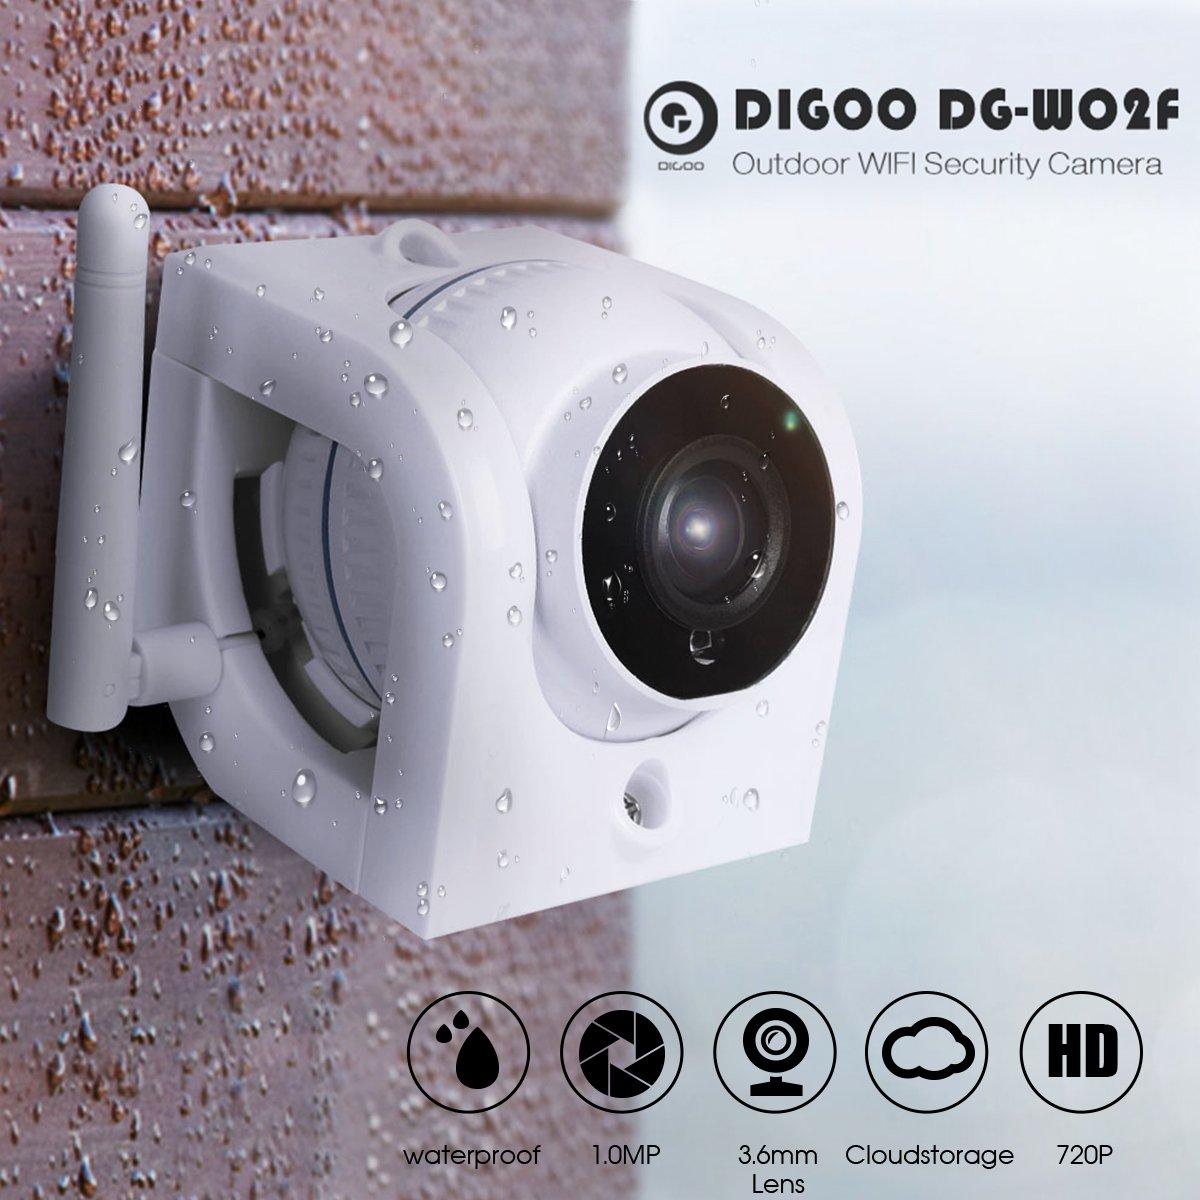 IOS/Android APP Night Vision WIFI Security IP Camera DIGOO DG-W02f